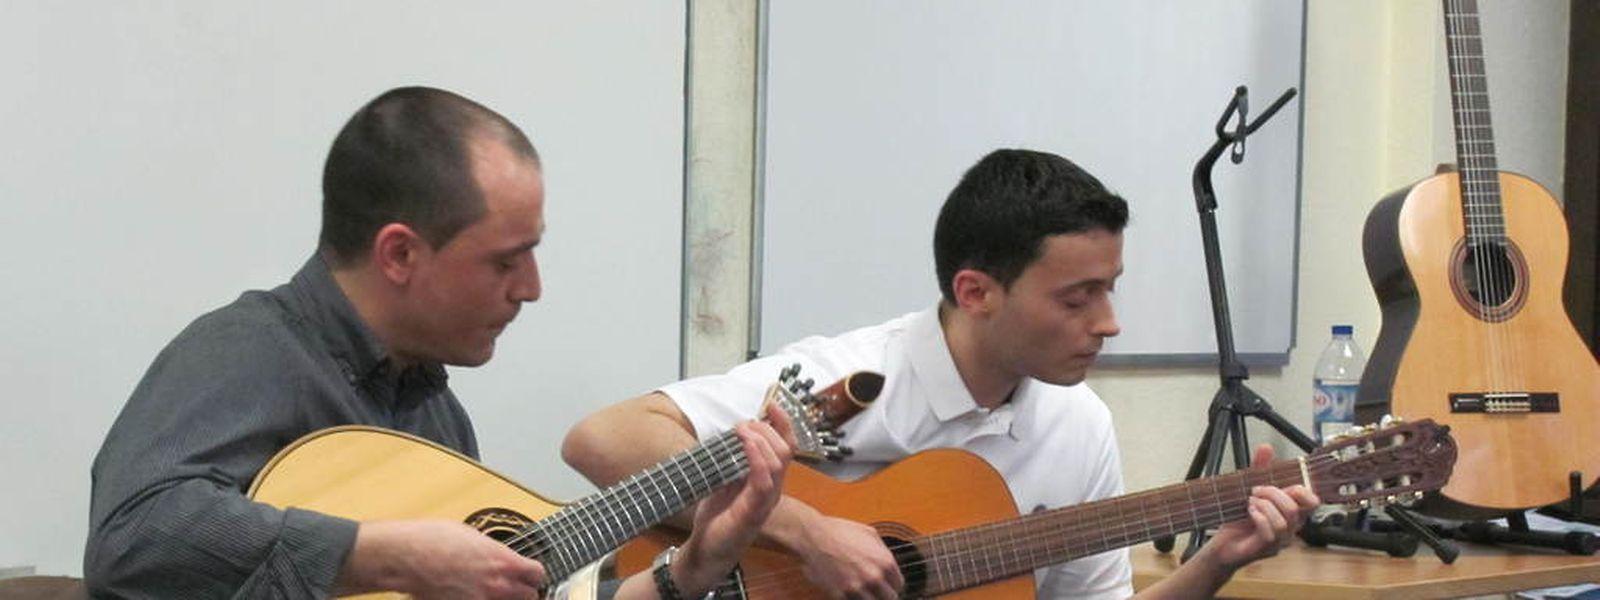 Pedro Quintas, à esquerda, diz-se apaixonado pela guitarra portuguesa